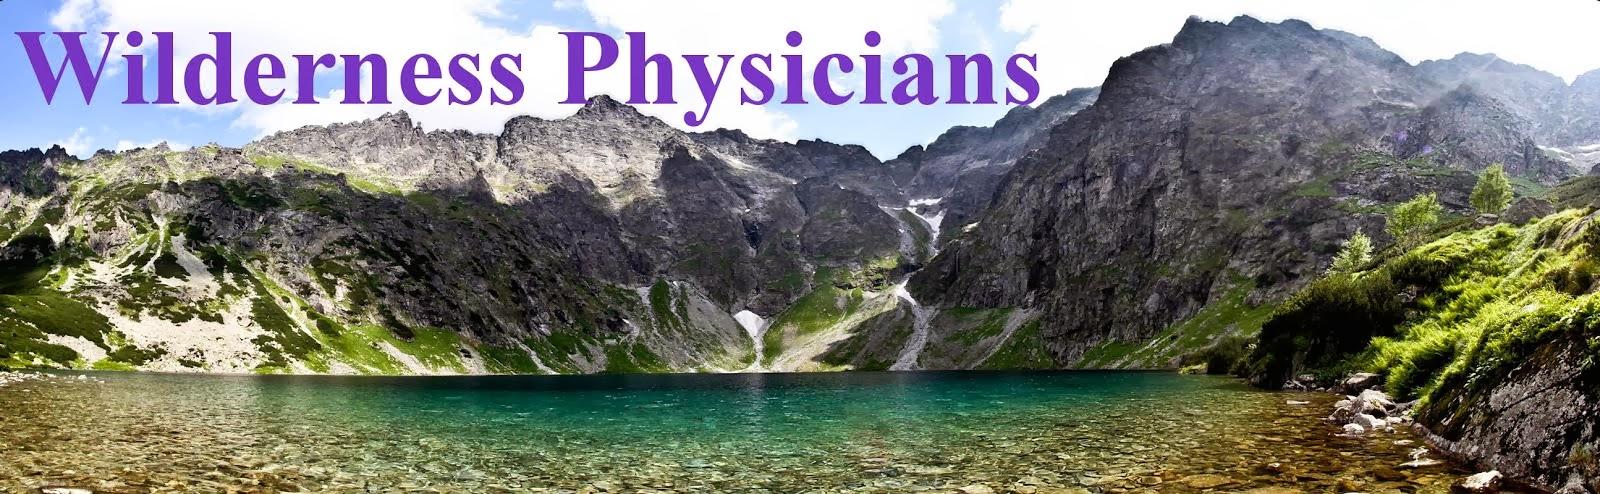 Wilderness Physicians